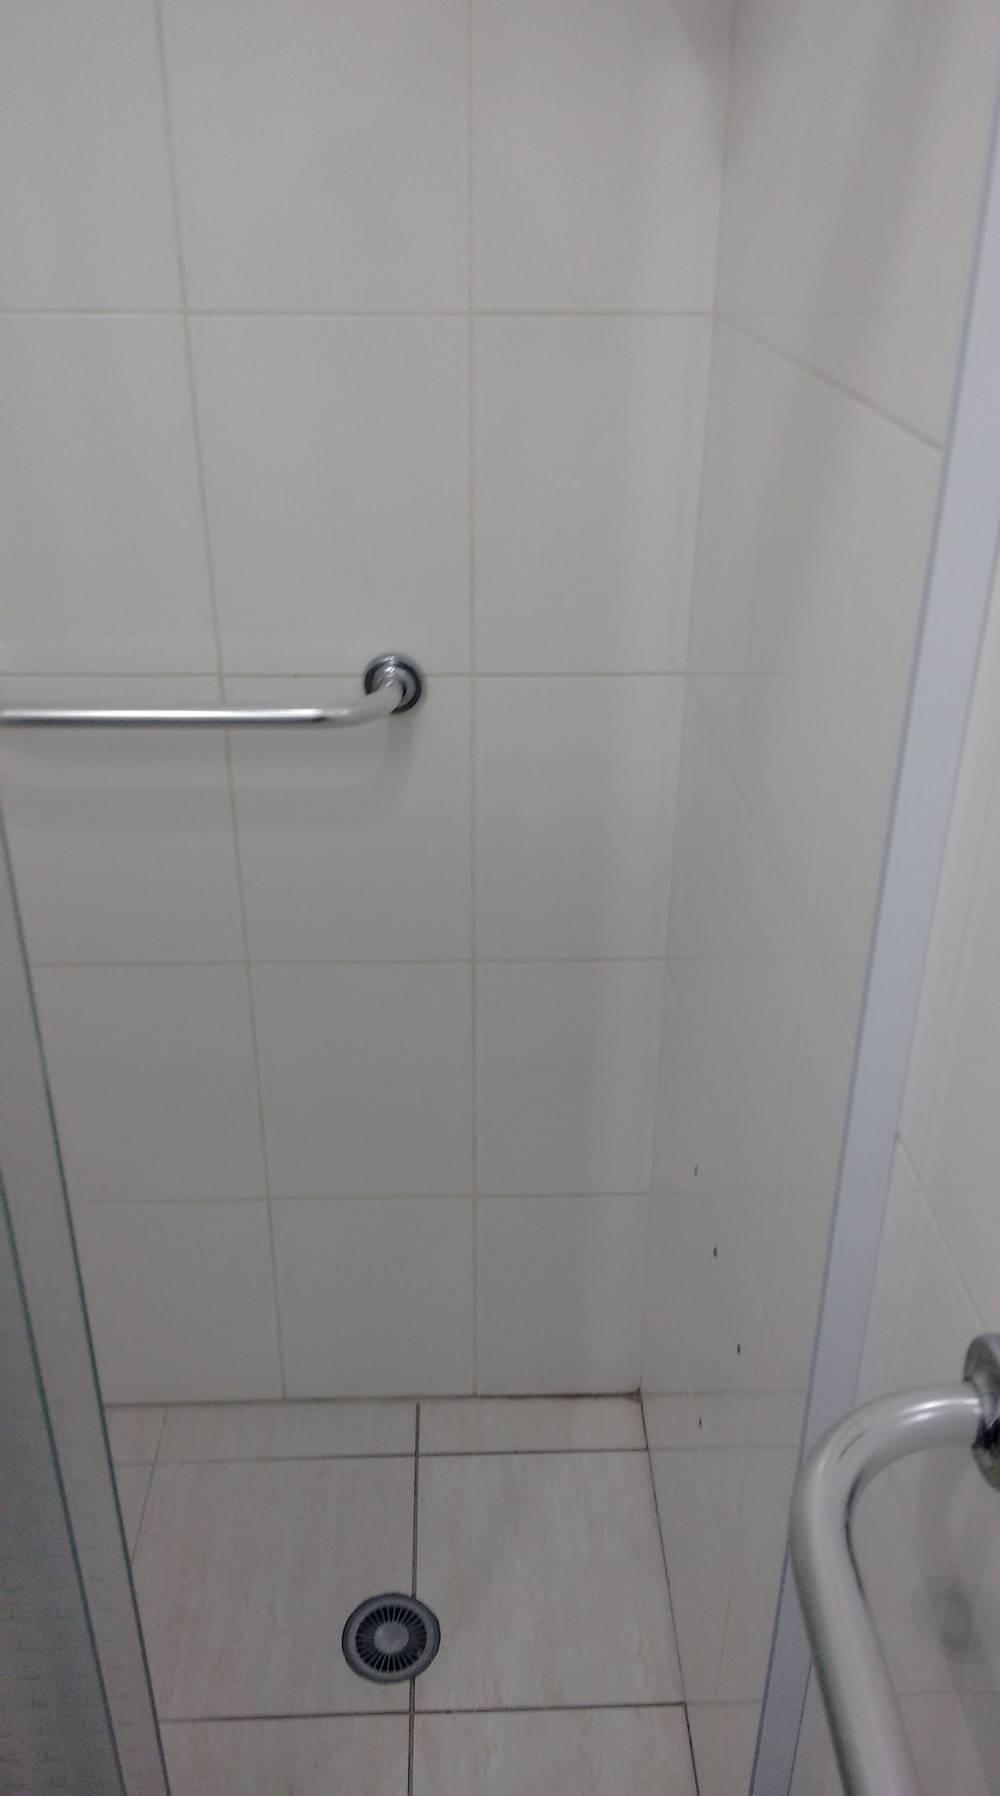 Serviço de Pequenos Reparos Residenciais na Centreville - Reparos Domésticos